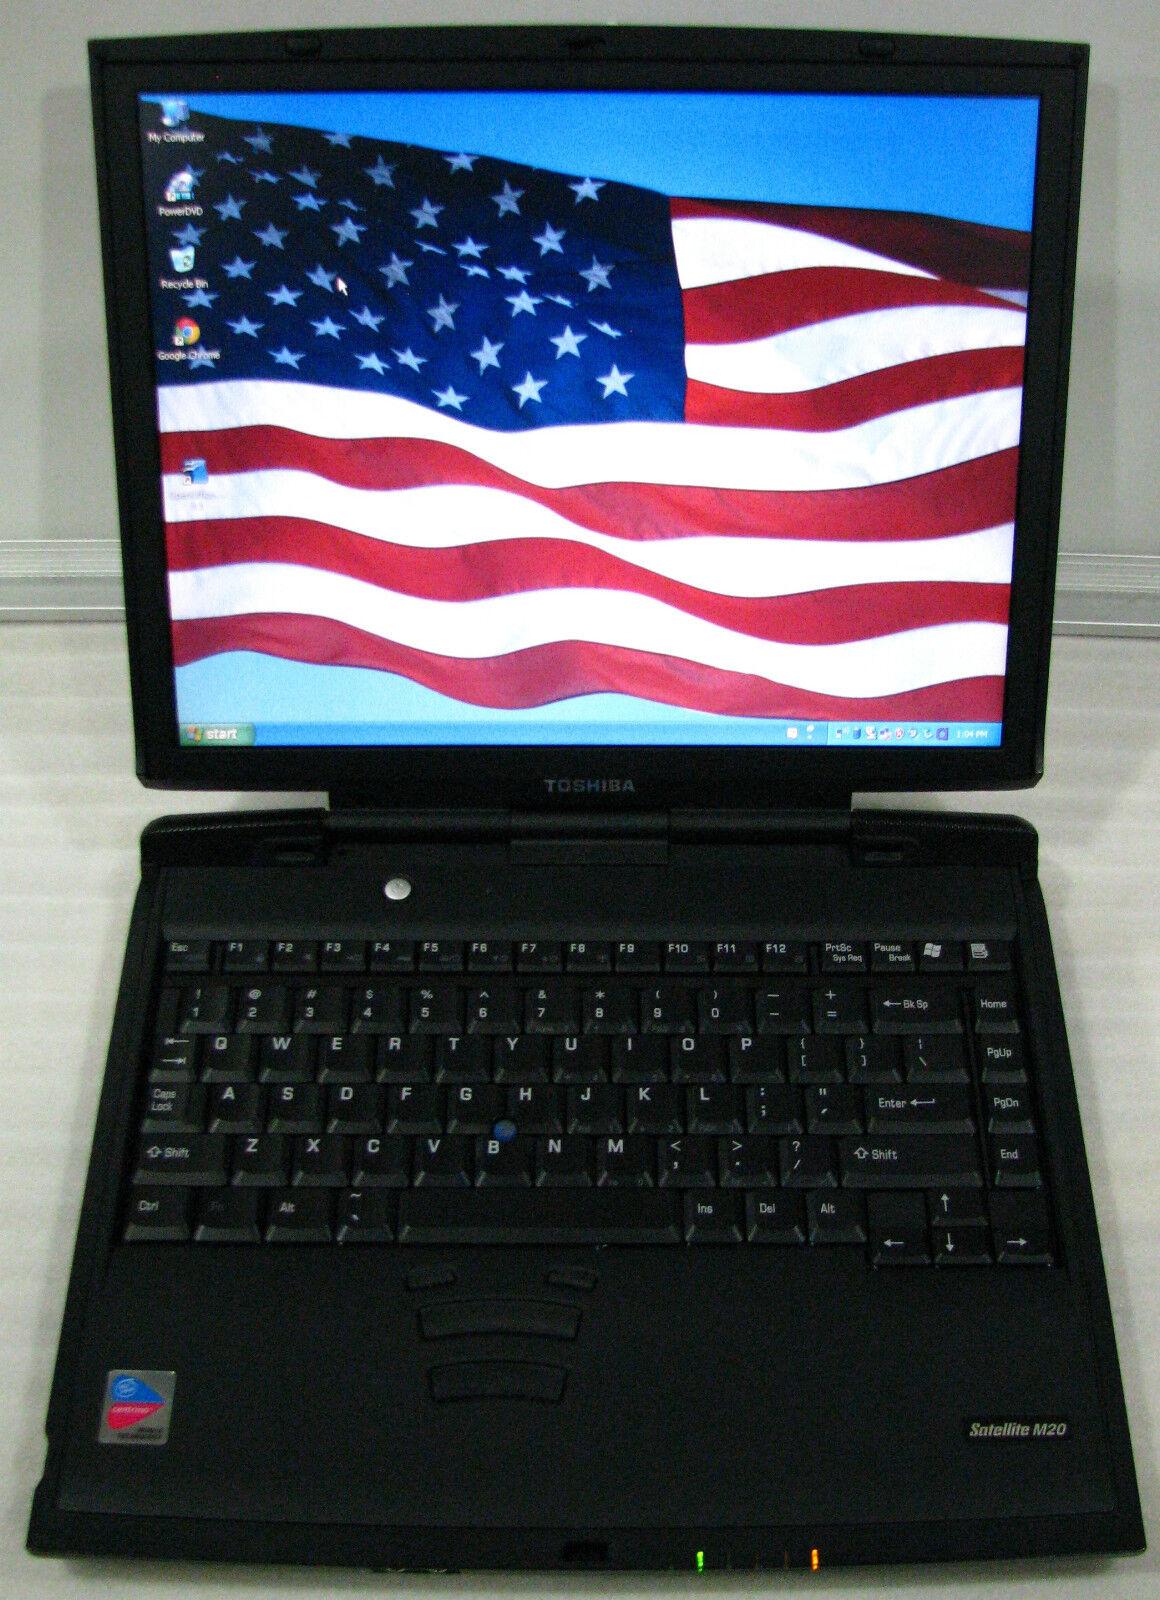 1 Toshiba Satellite M20 Business Laptop Notebook DVD/CDRW 1.3GHZ 40GB 512MB WIFI